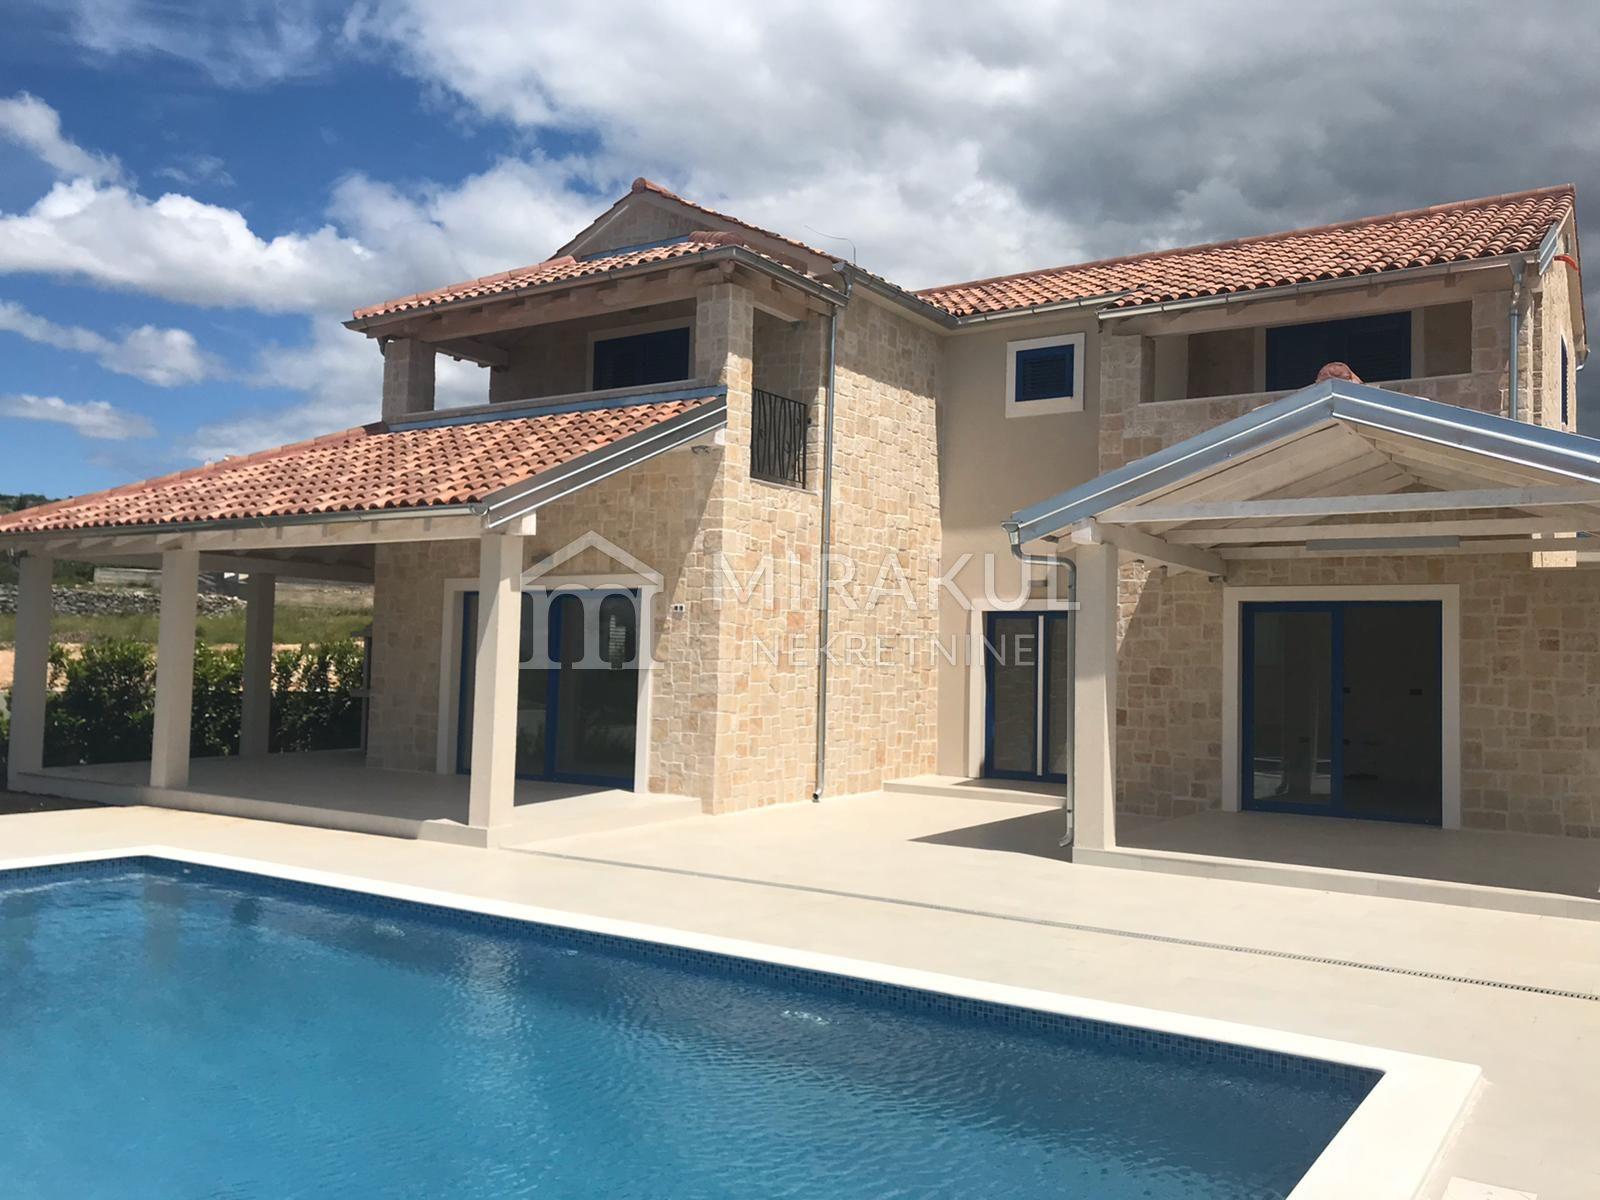 Real estate Primošten, New stone villa with pool